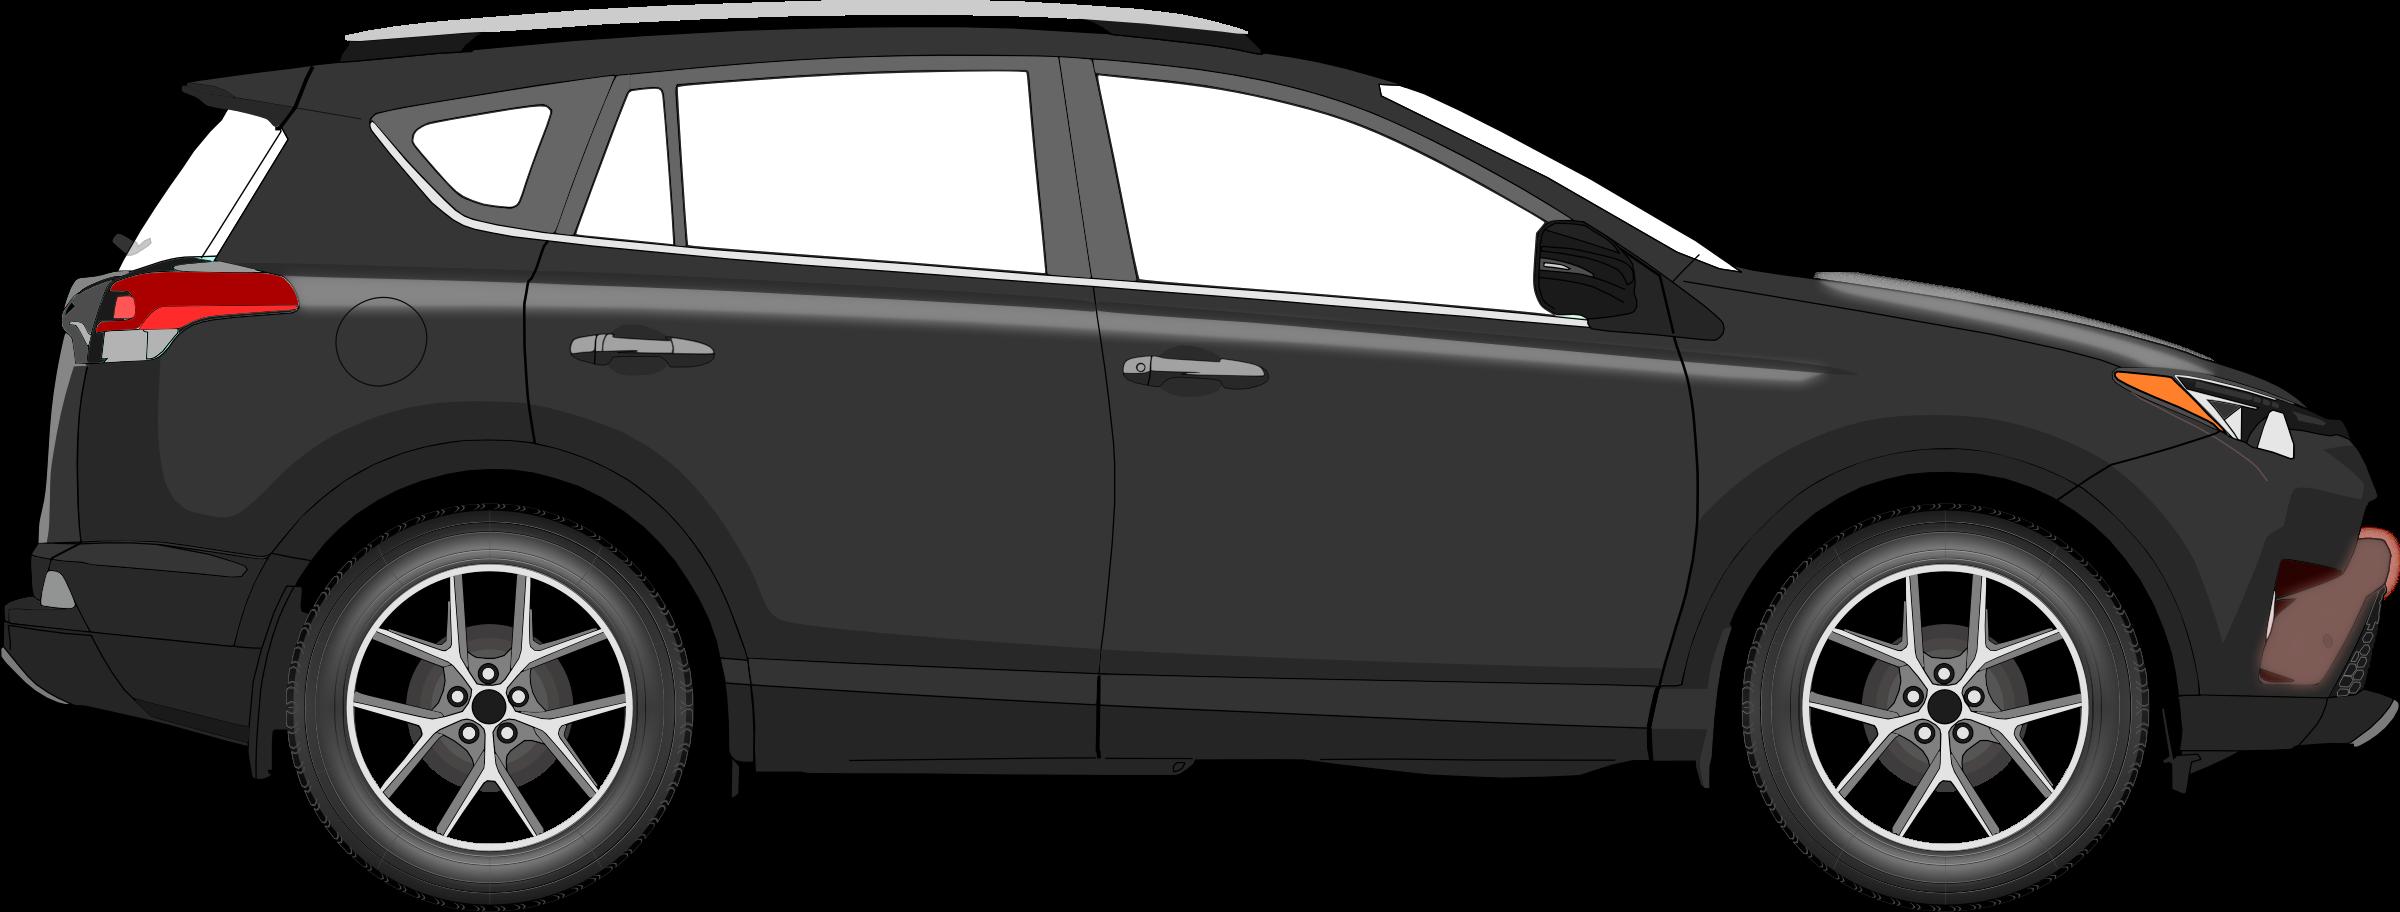 Grey car clipart picture transparent stock Clipart - Car 14 (grey) picture transparent stock